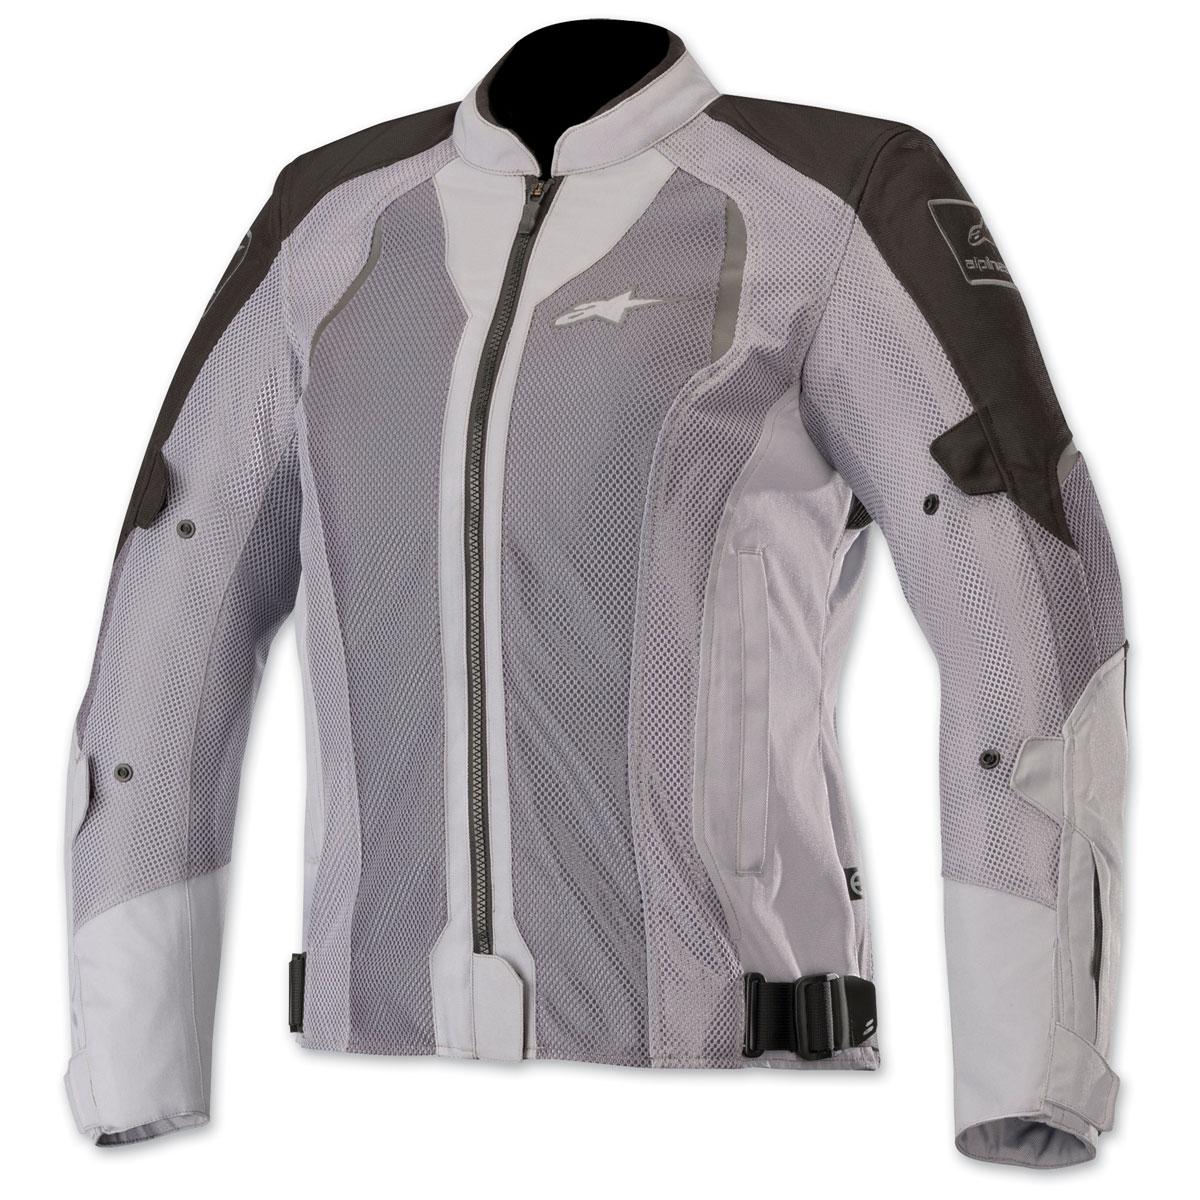 Alpinestars Women's Stella Wake Air Black/Gray Textile Jacket